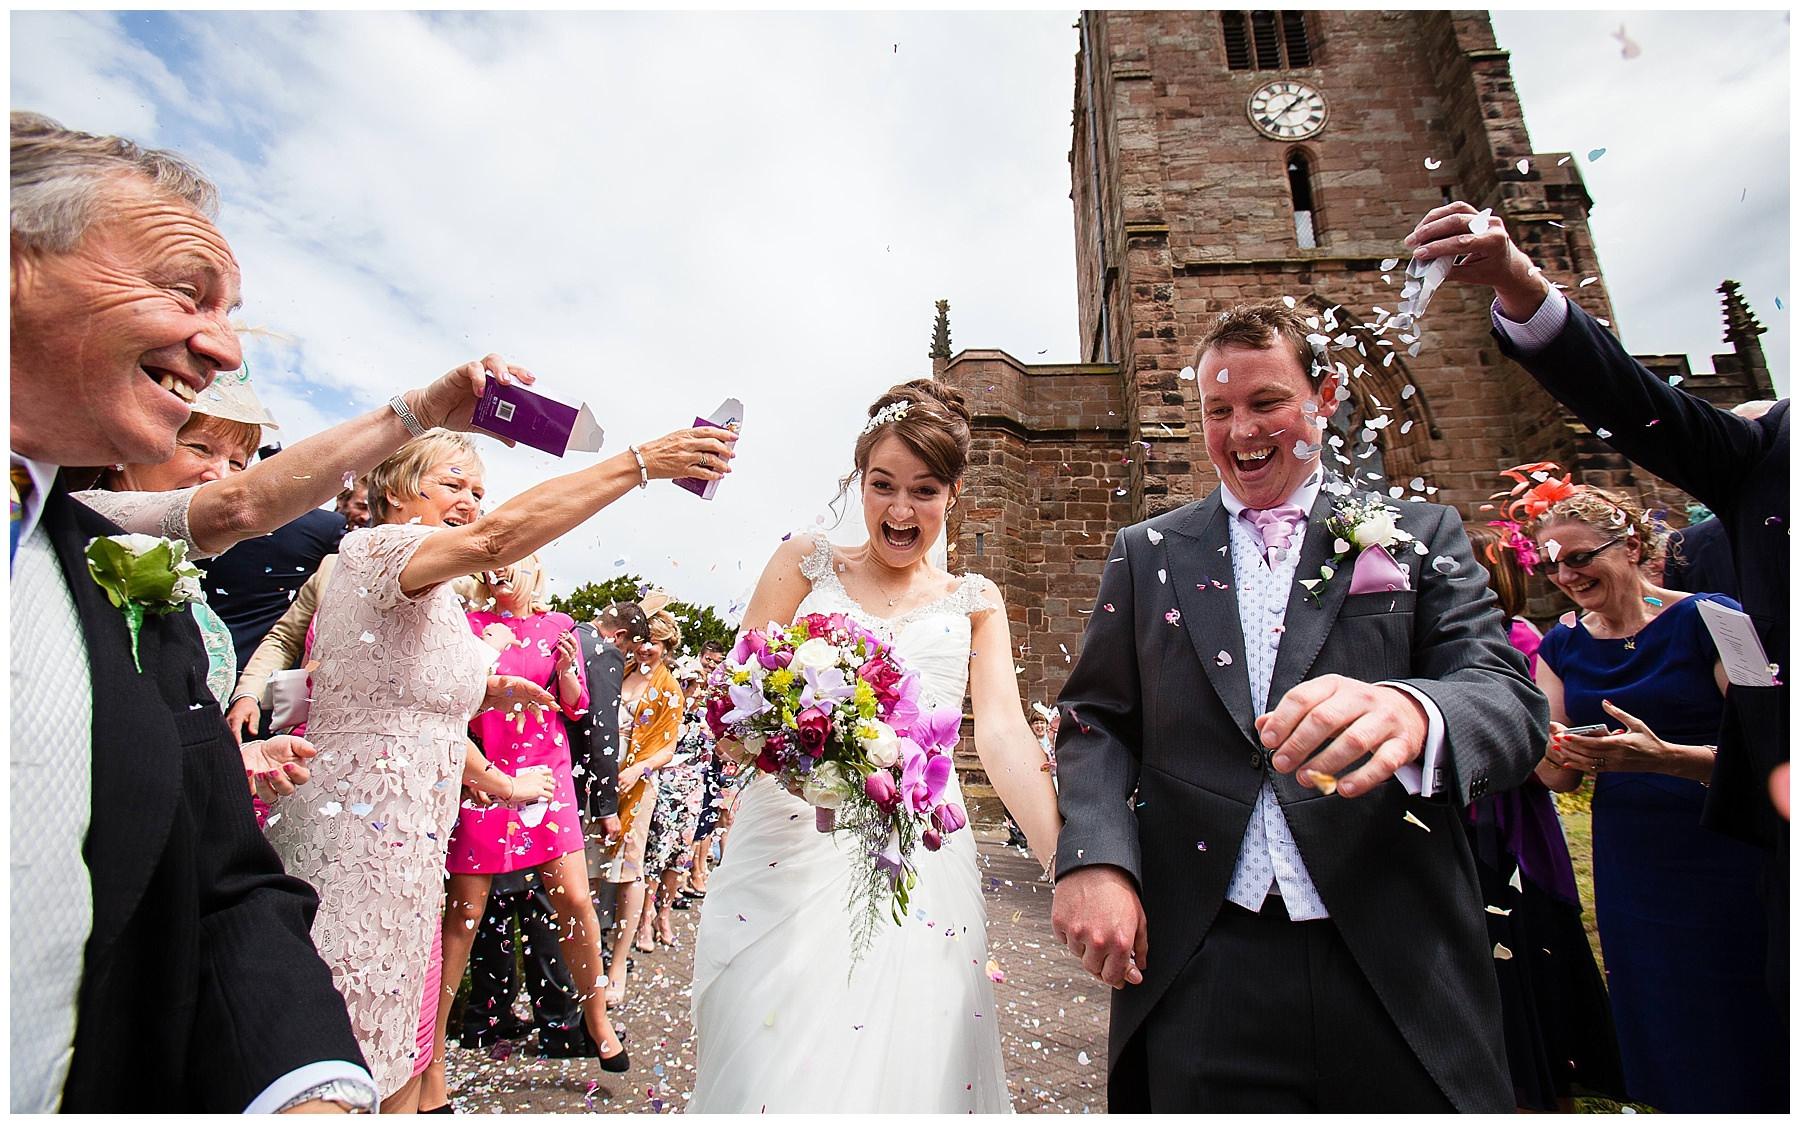 confetti at church wedding at st. boniface church, bunbury cheshire